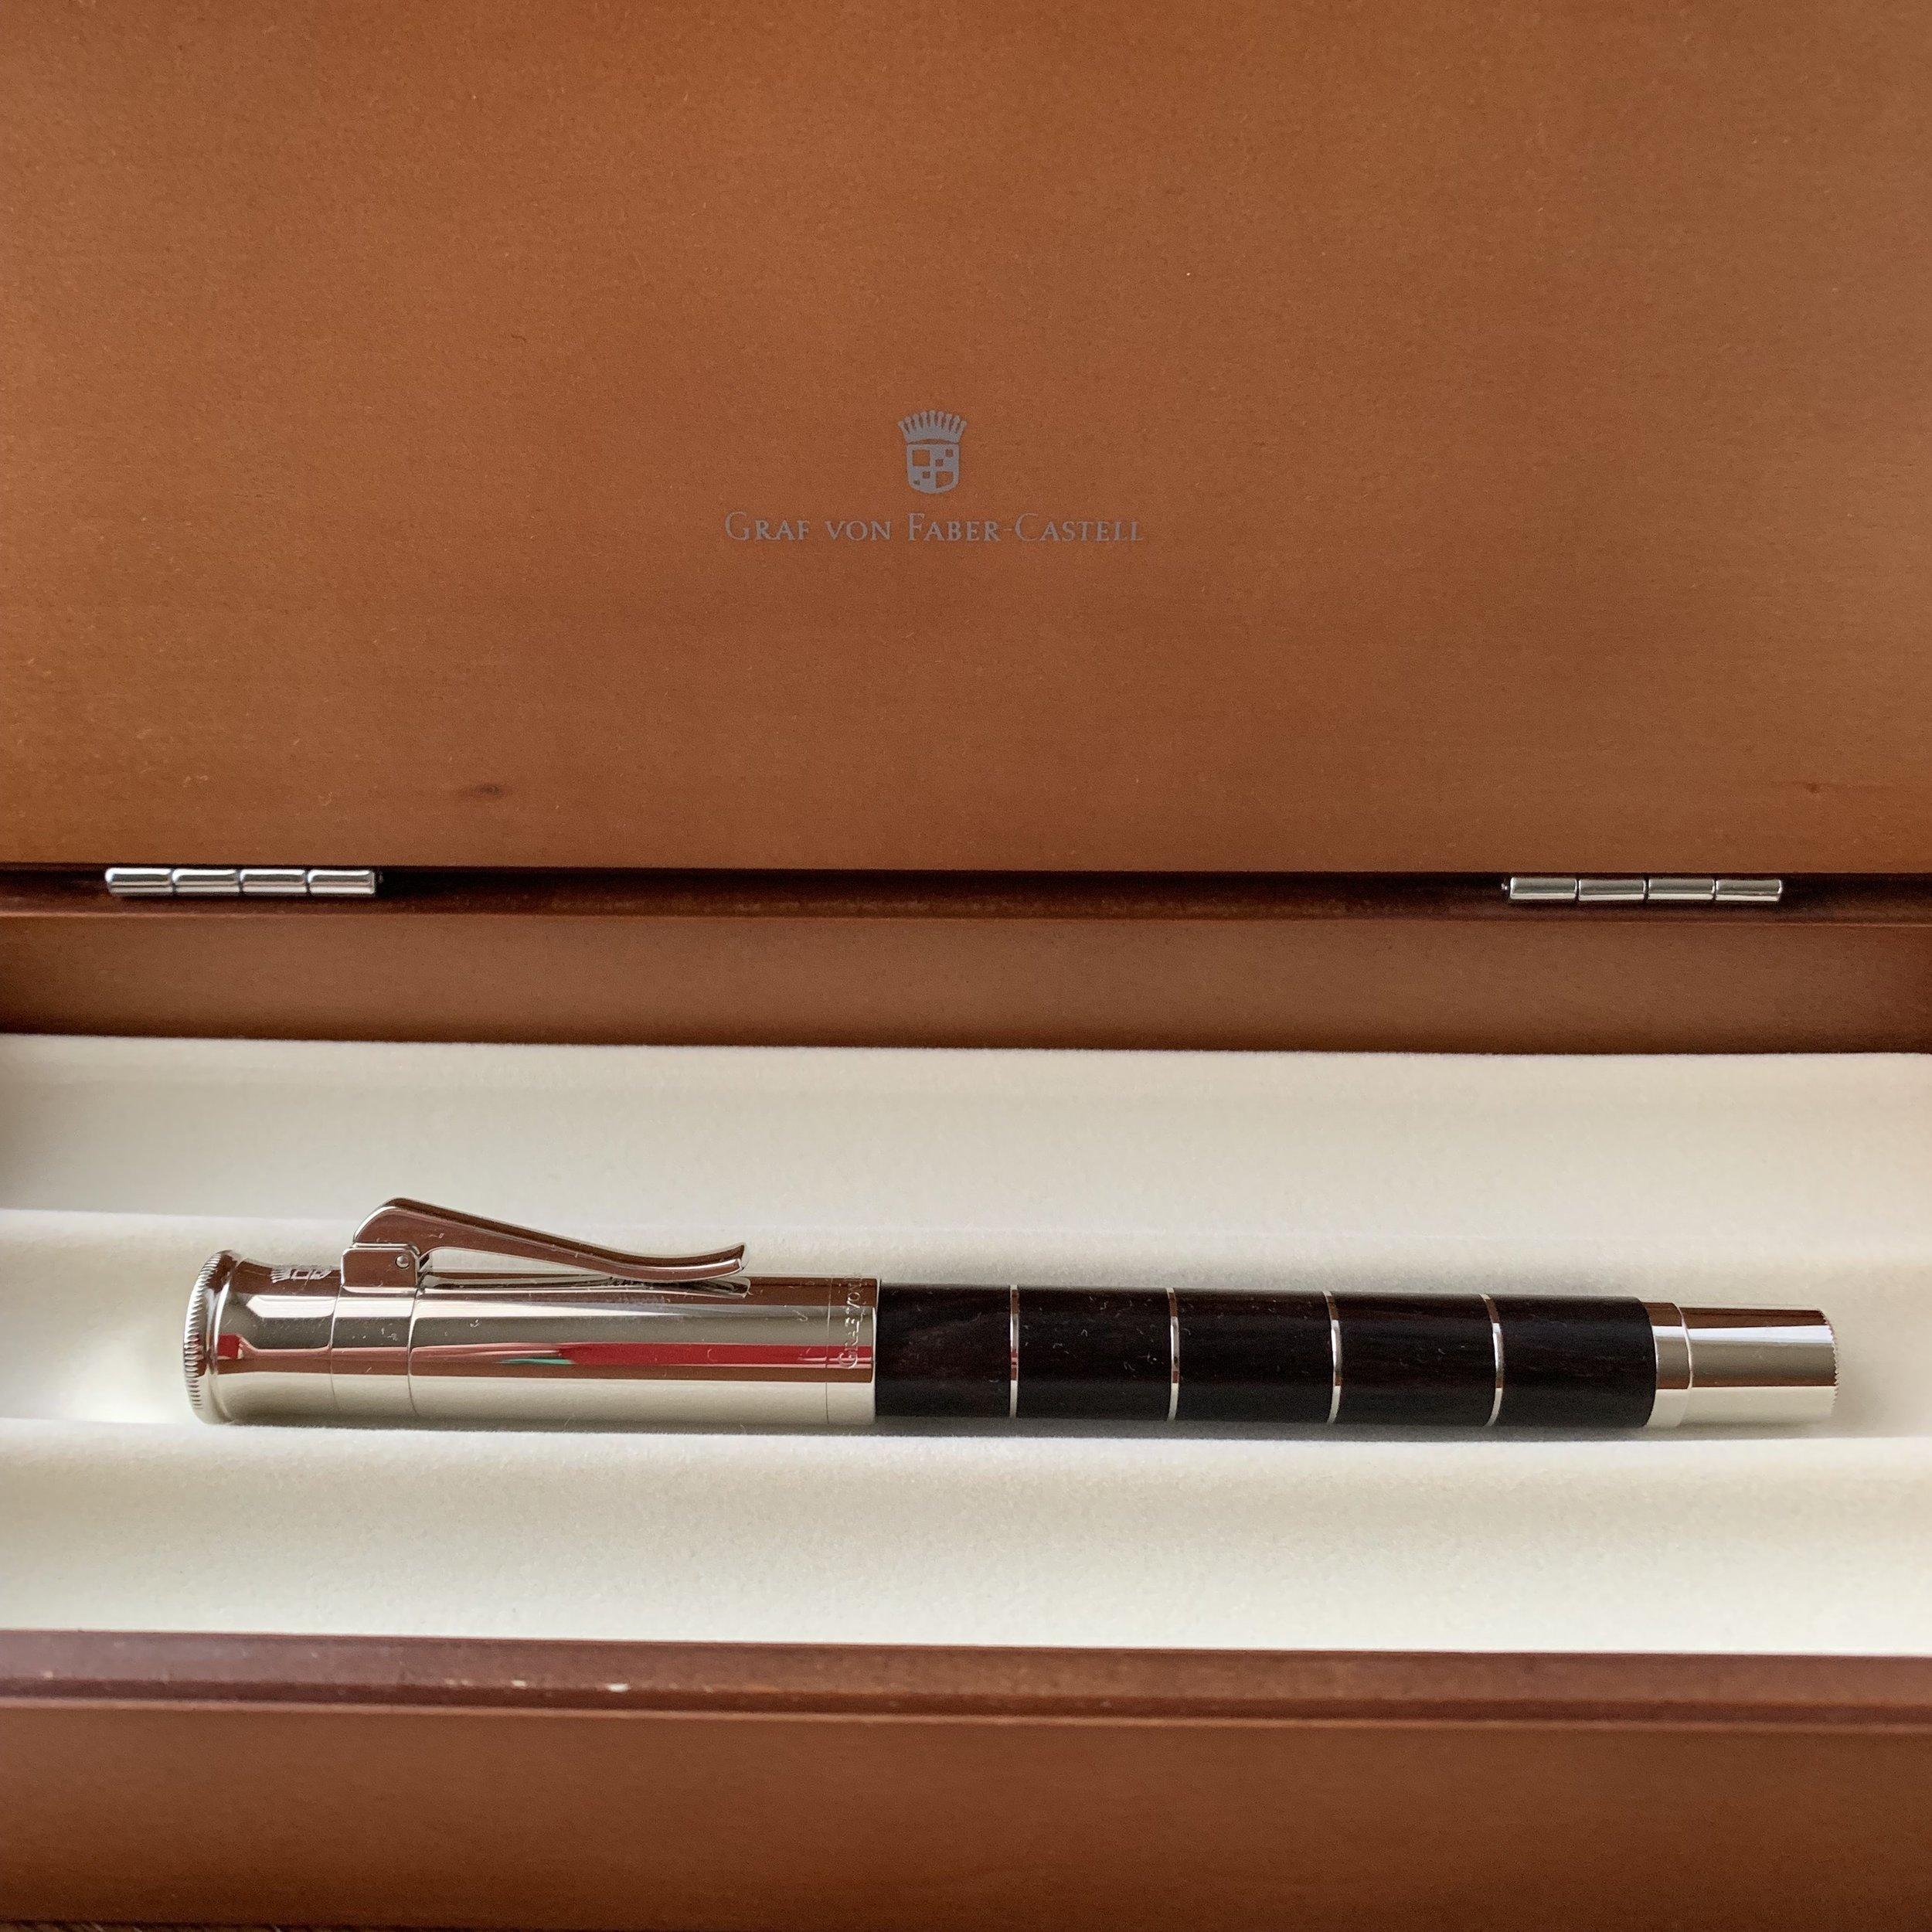 Graf von Faber-Castell Classic in the Presentation Box